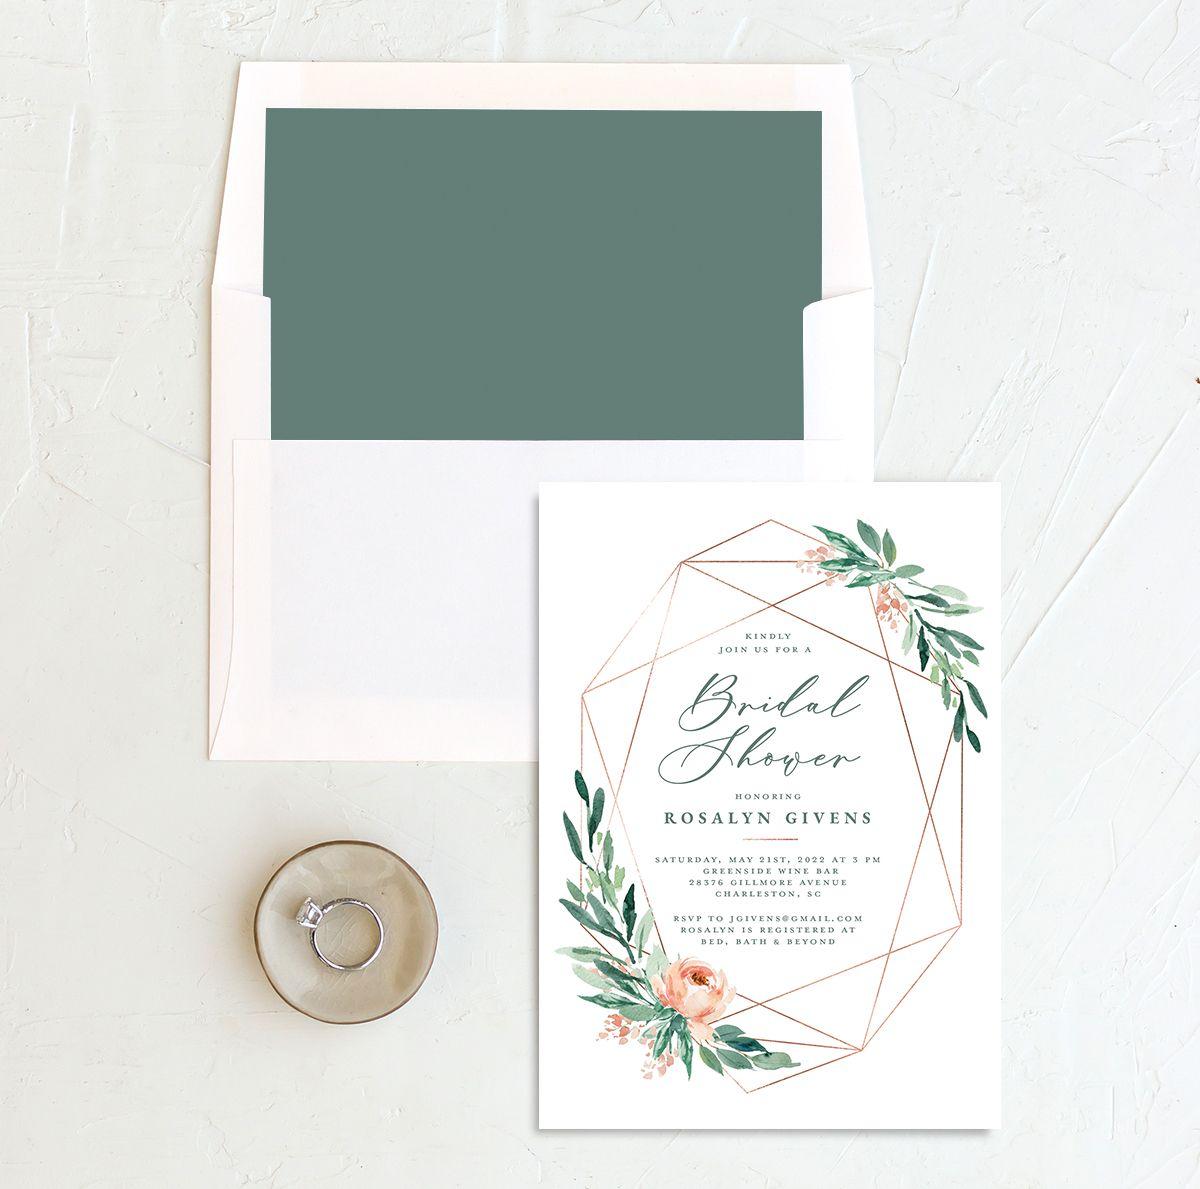 Gilded Botanical Bridal Shower Invitation front with DIY liner in green